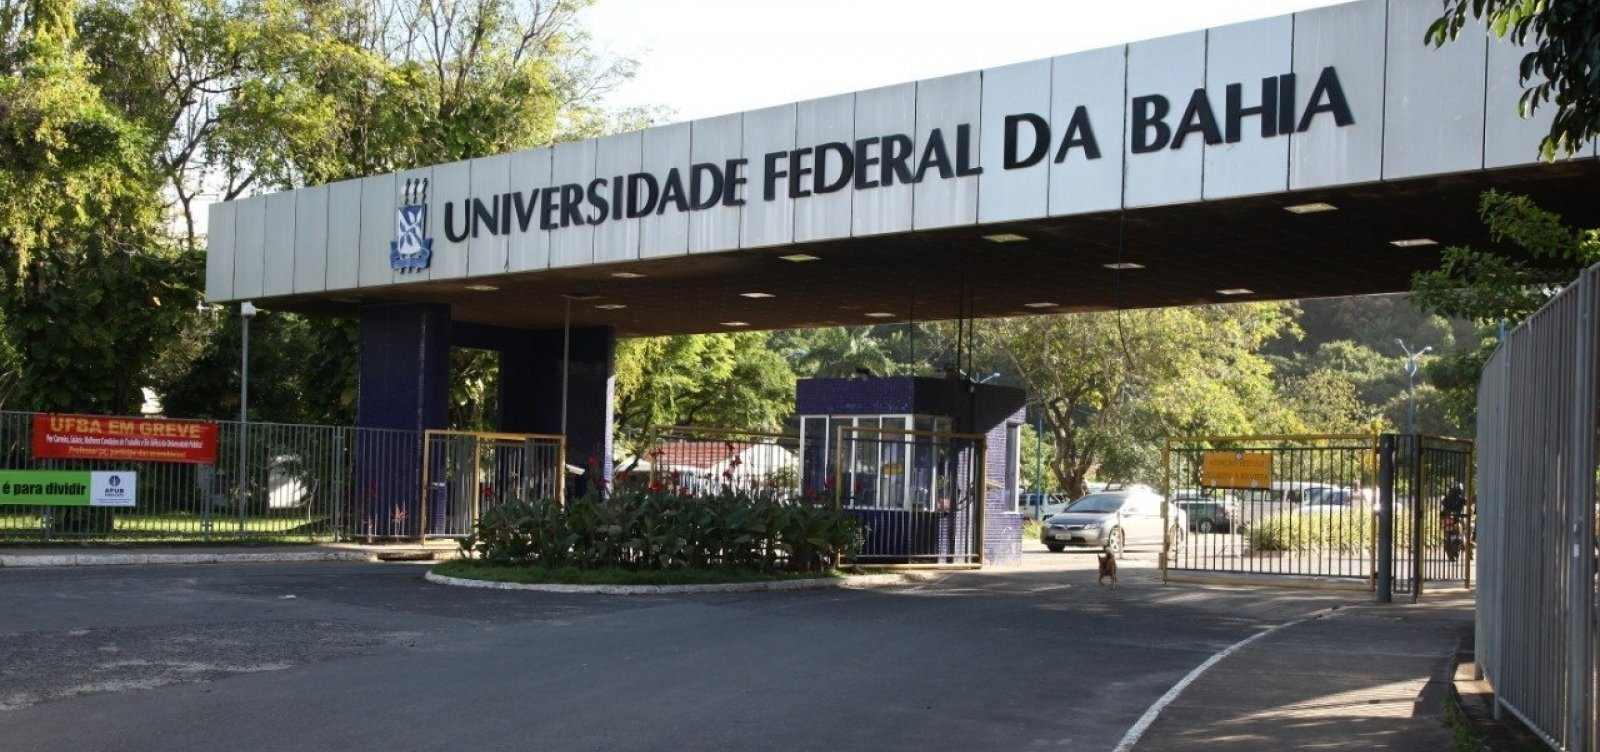 [Investimentos do MEC durante governo Bolsonaro chegam ao menor patamar desde 2015]